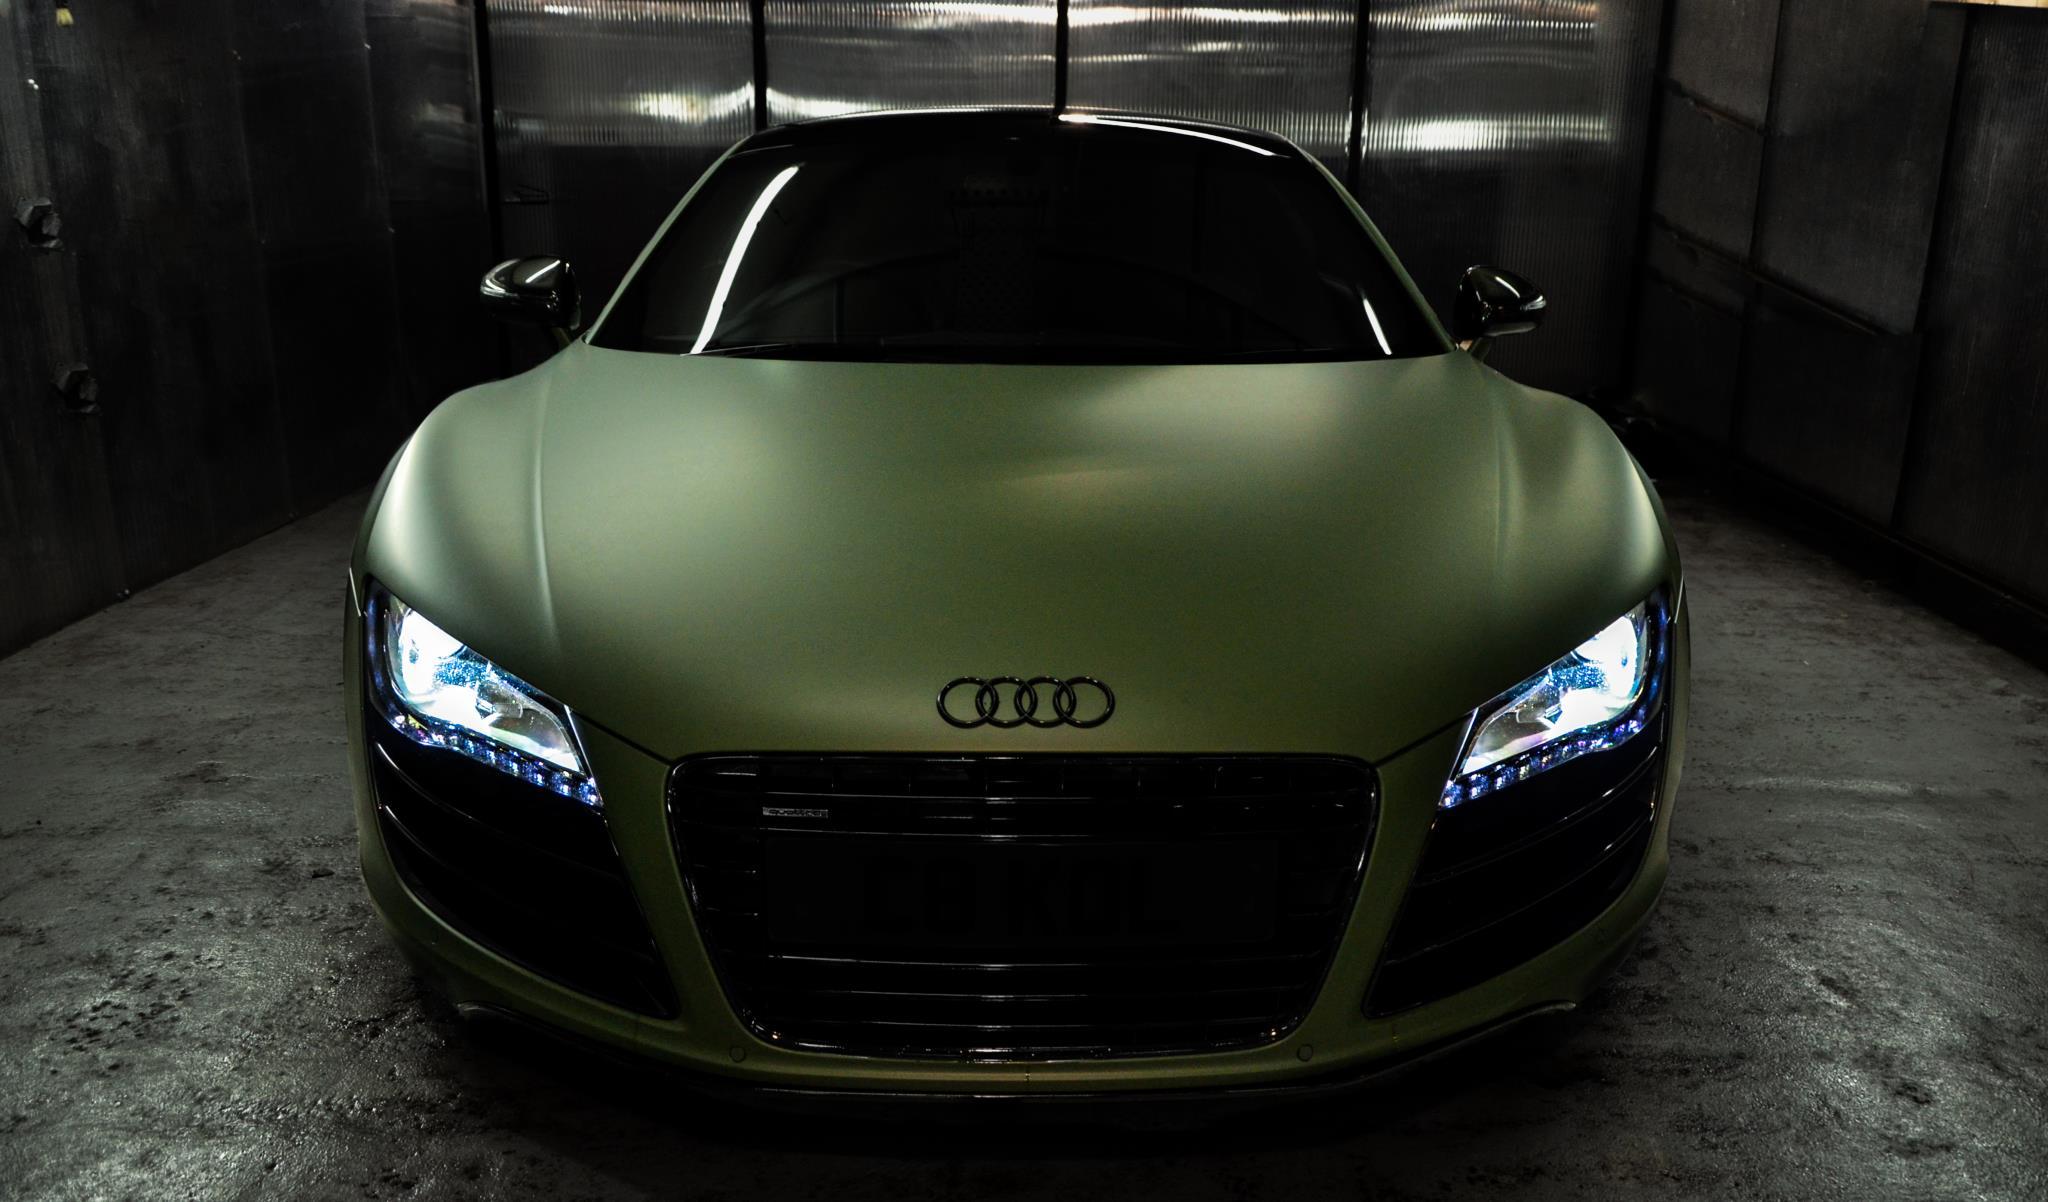 Audi V10 By Hd Car Wallpapers R8 Wallpaper Black Matte